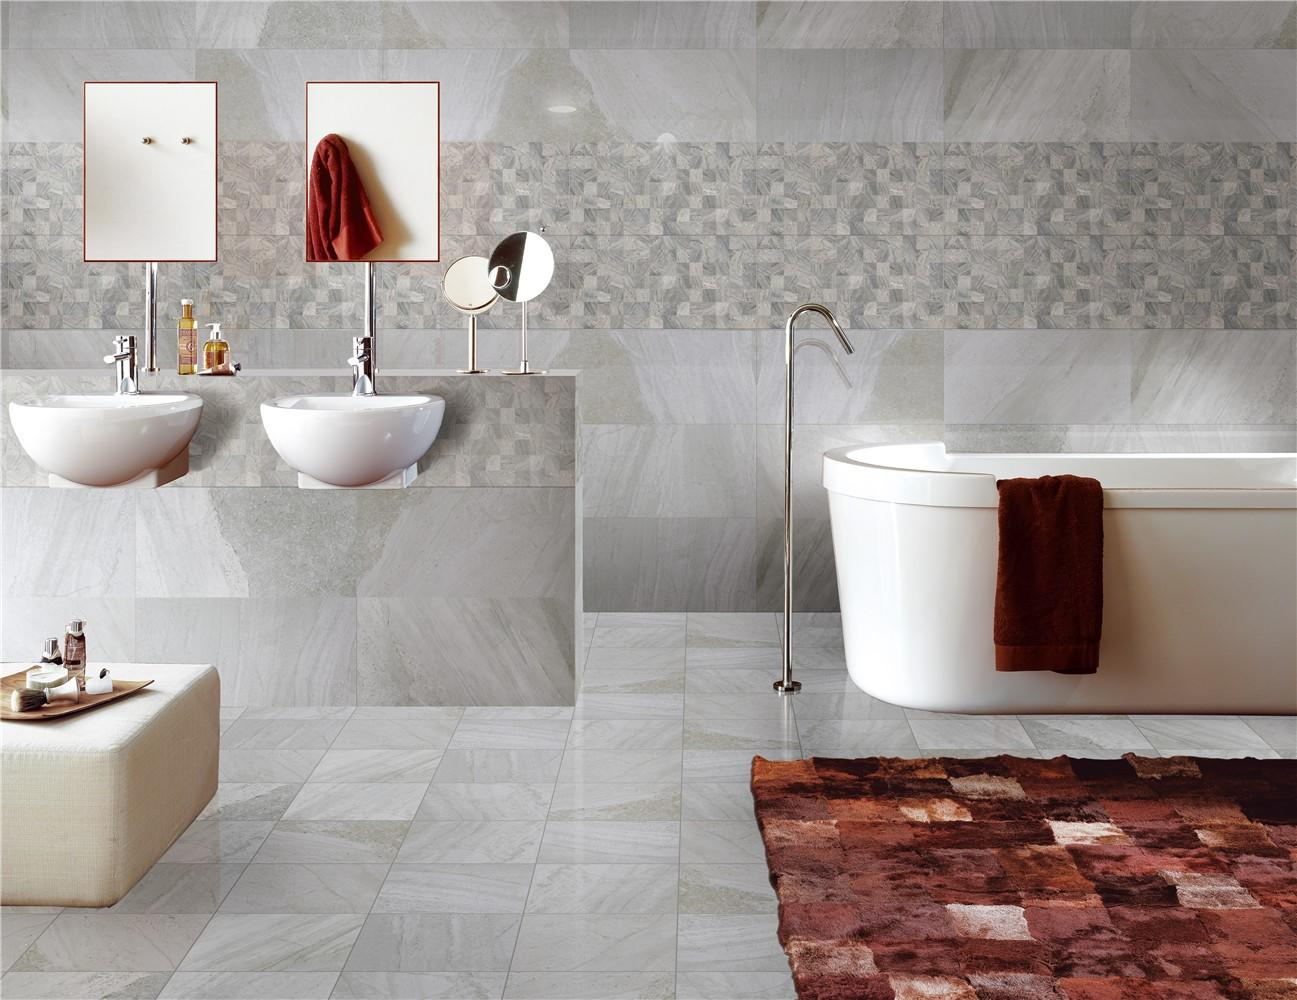 white wave 300x600mm Ceramic Wall Tile wave bulk production Borders